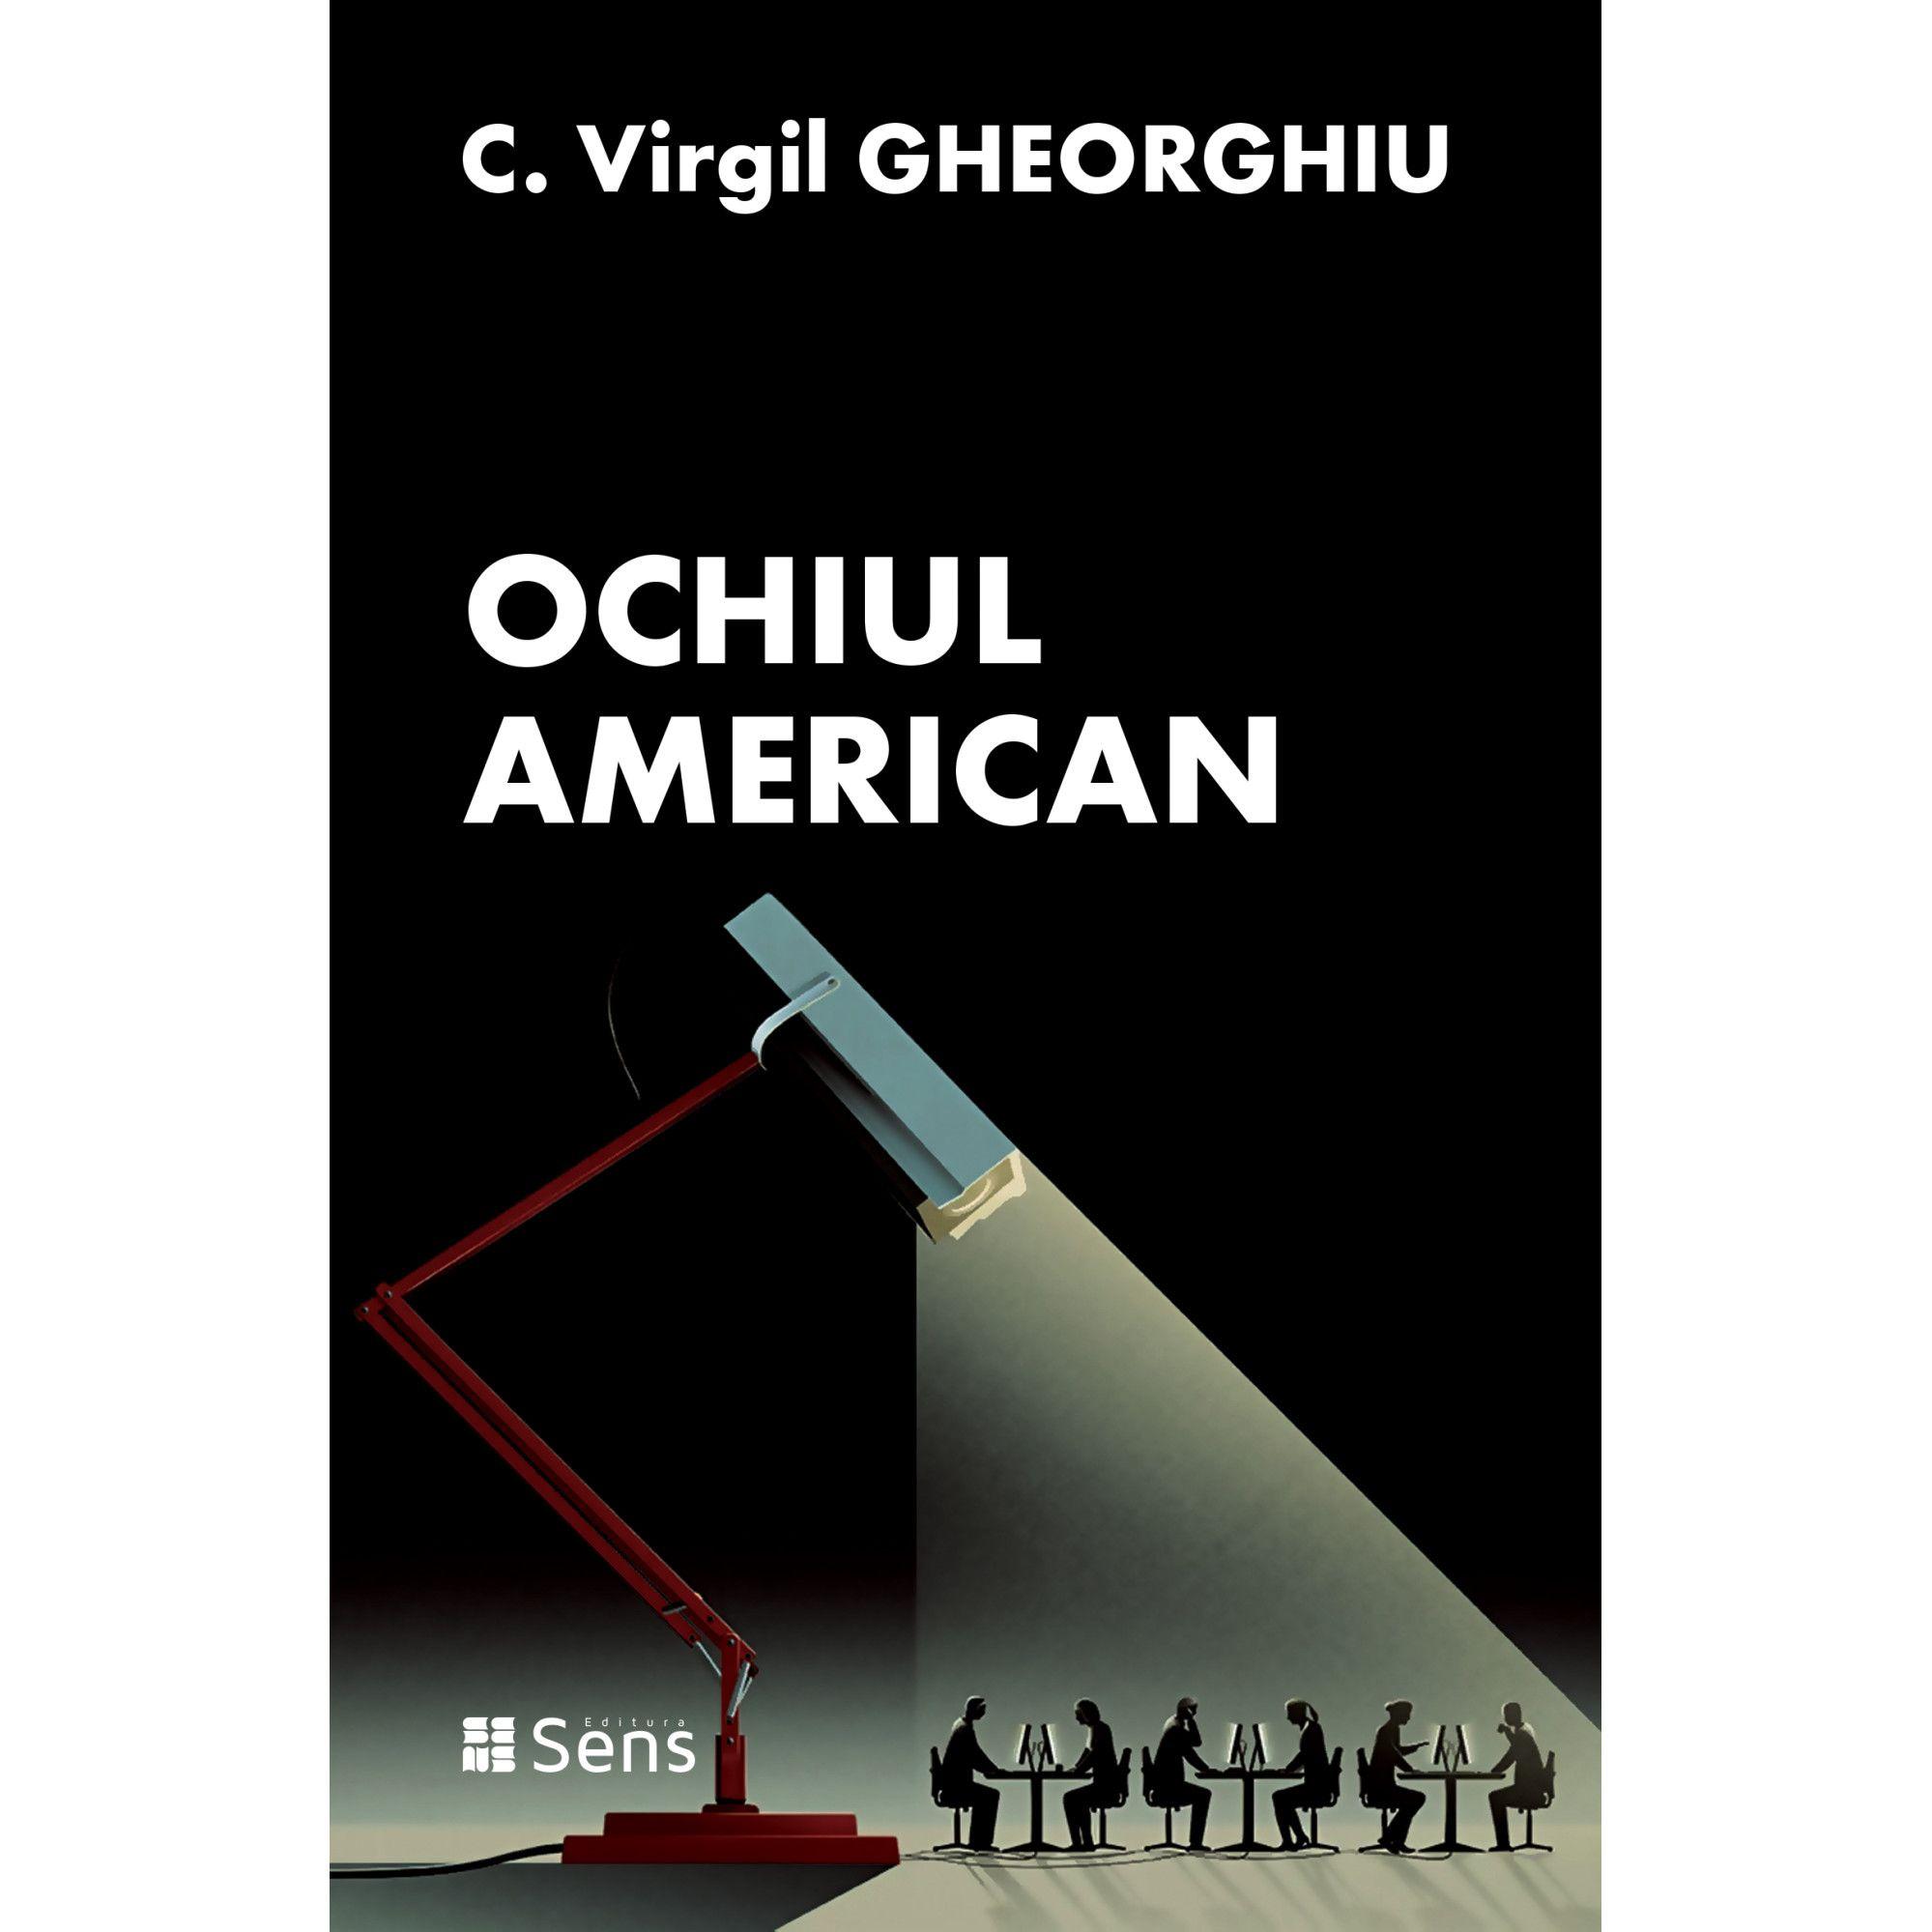 C. Virgil GHEORGHIU | Ochiul american